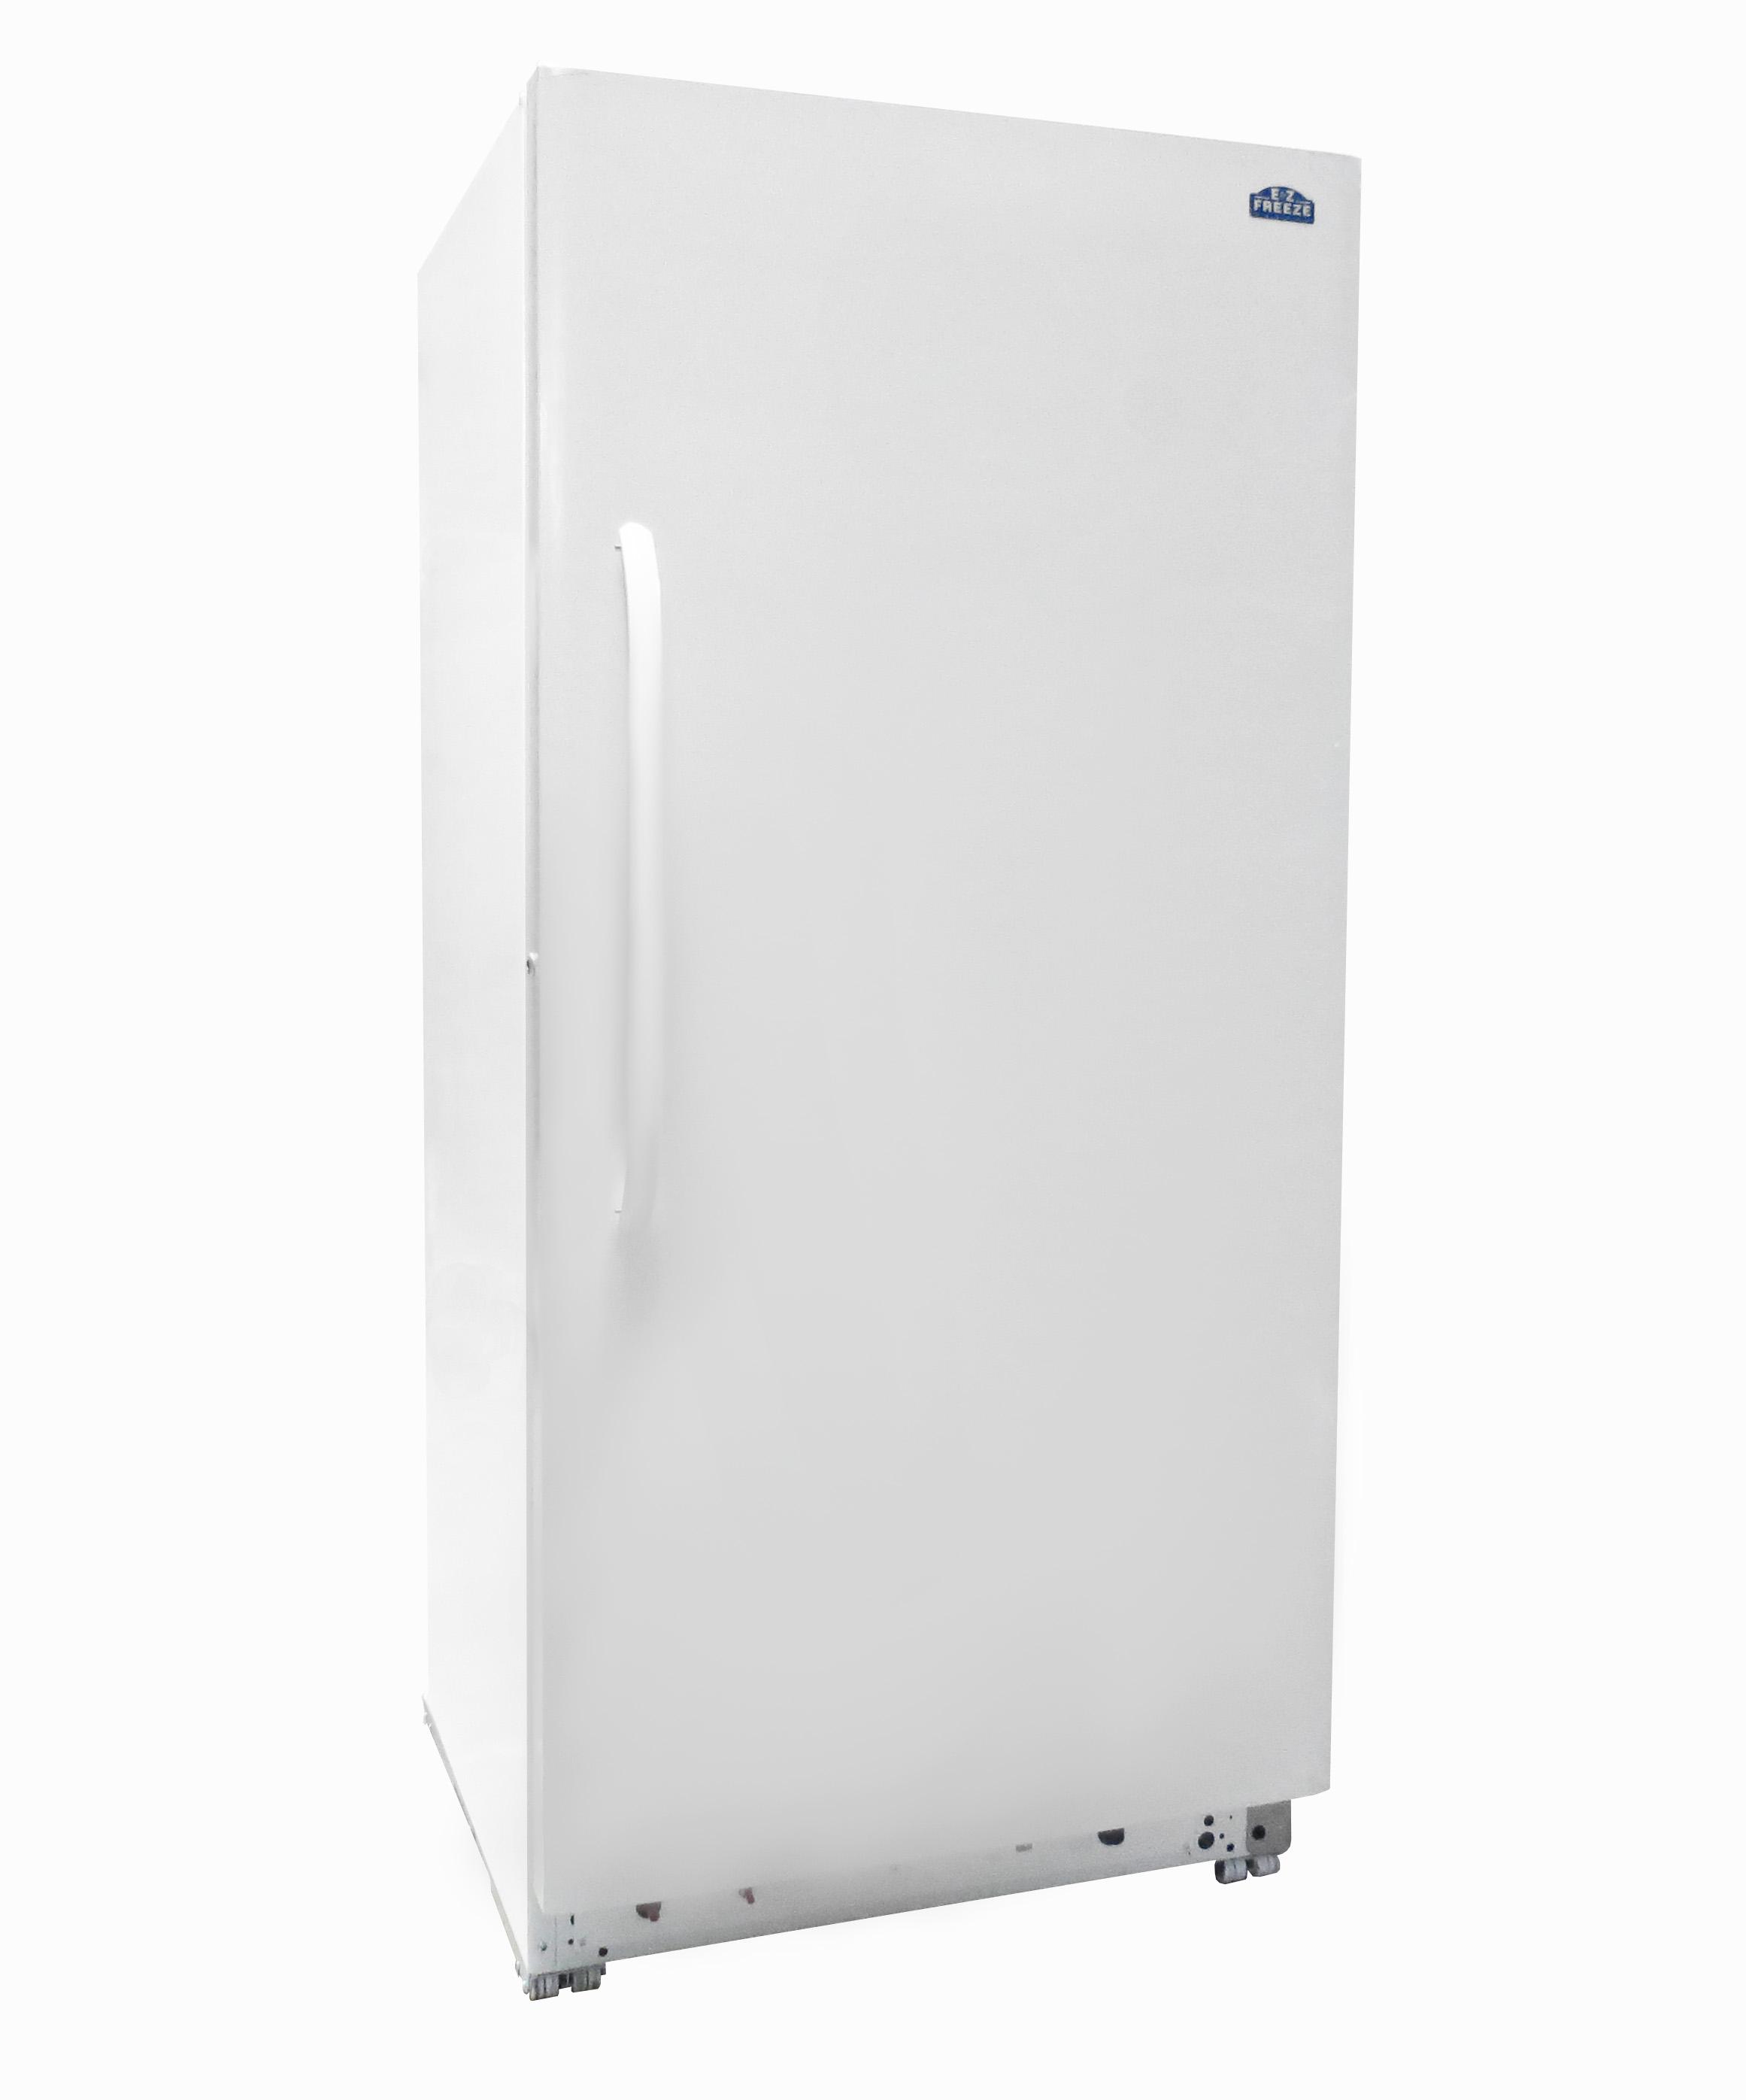 Propane fridge